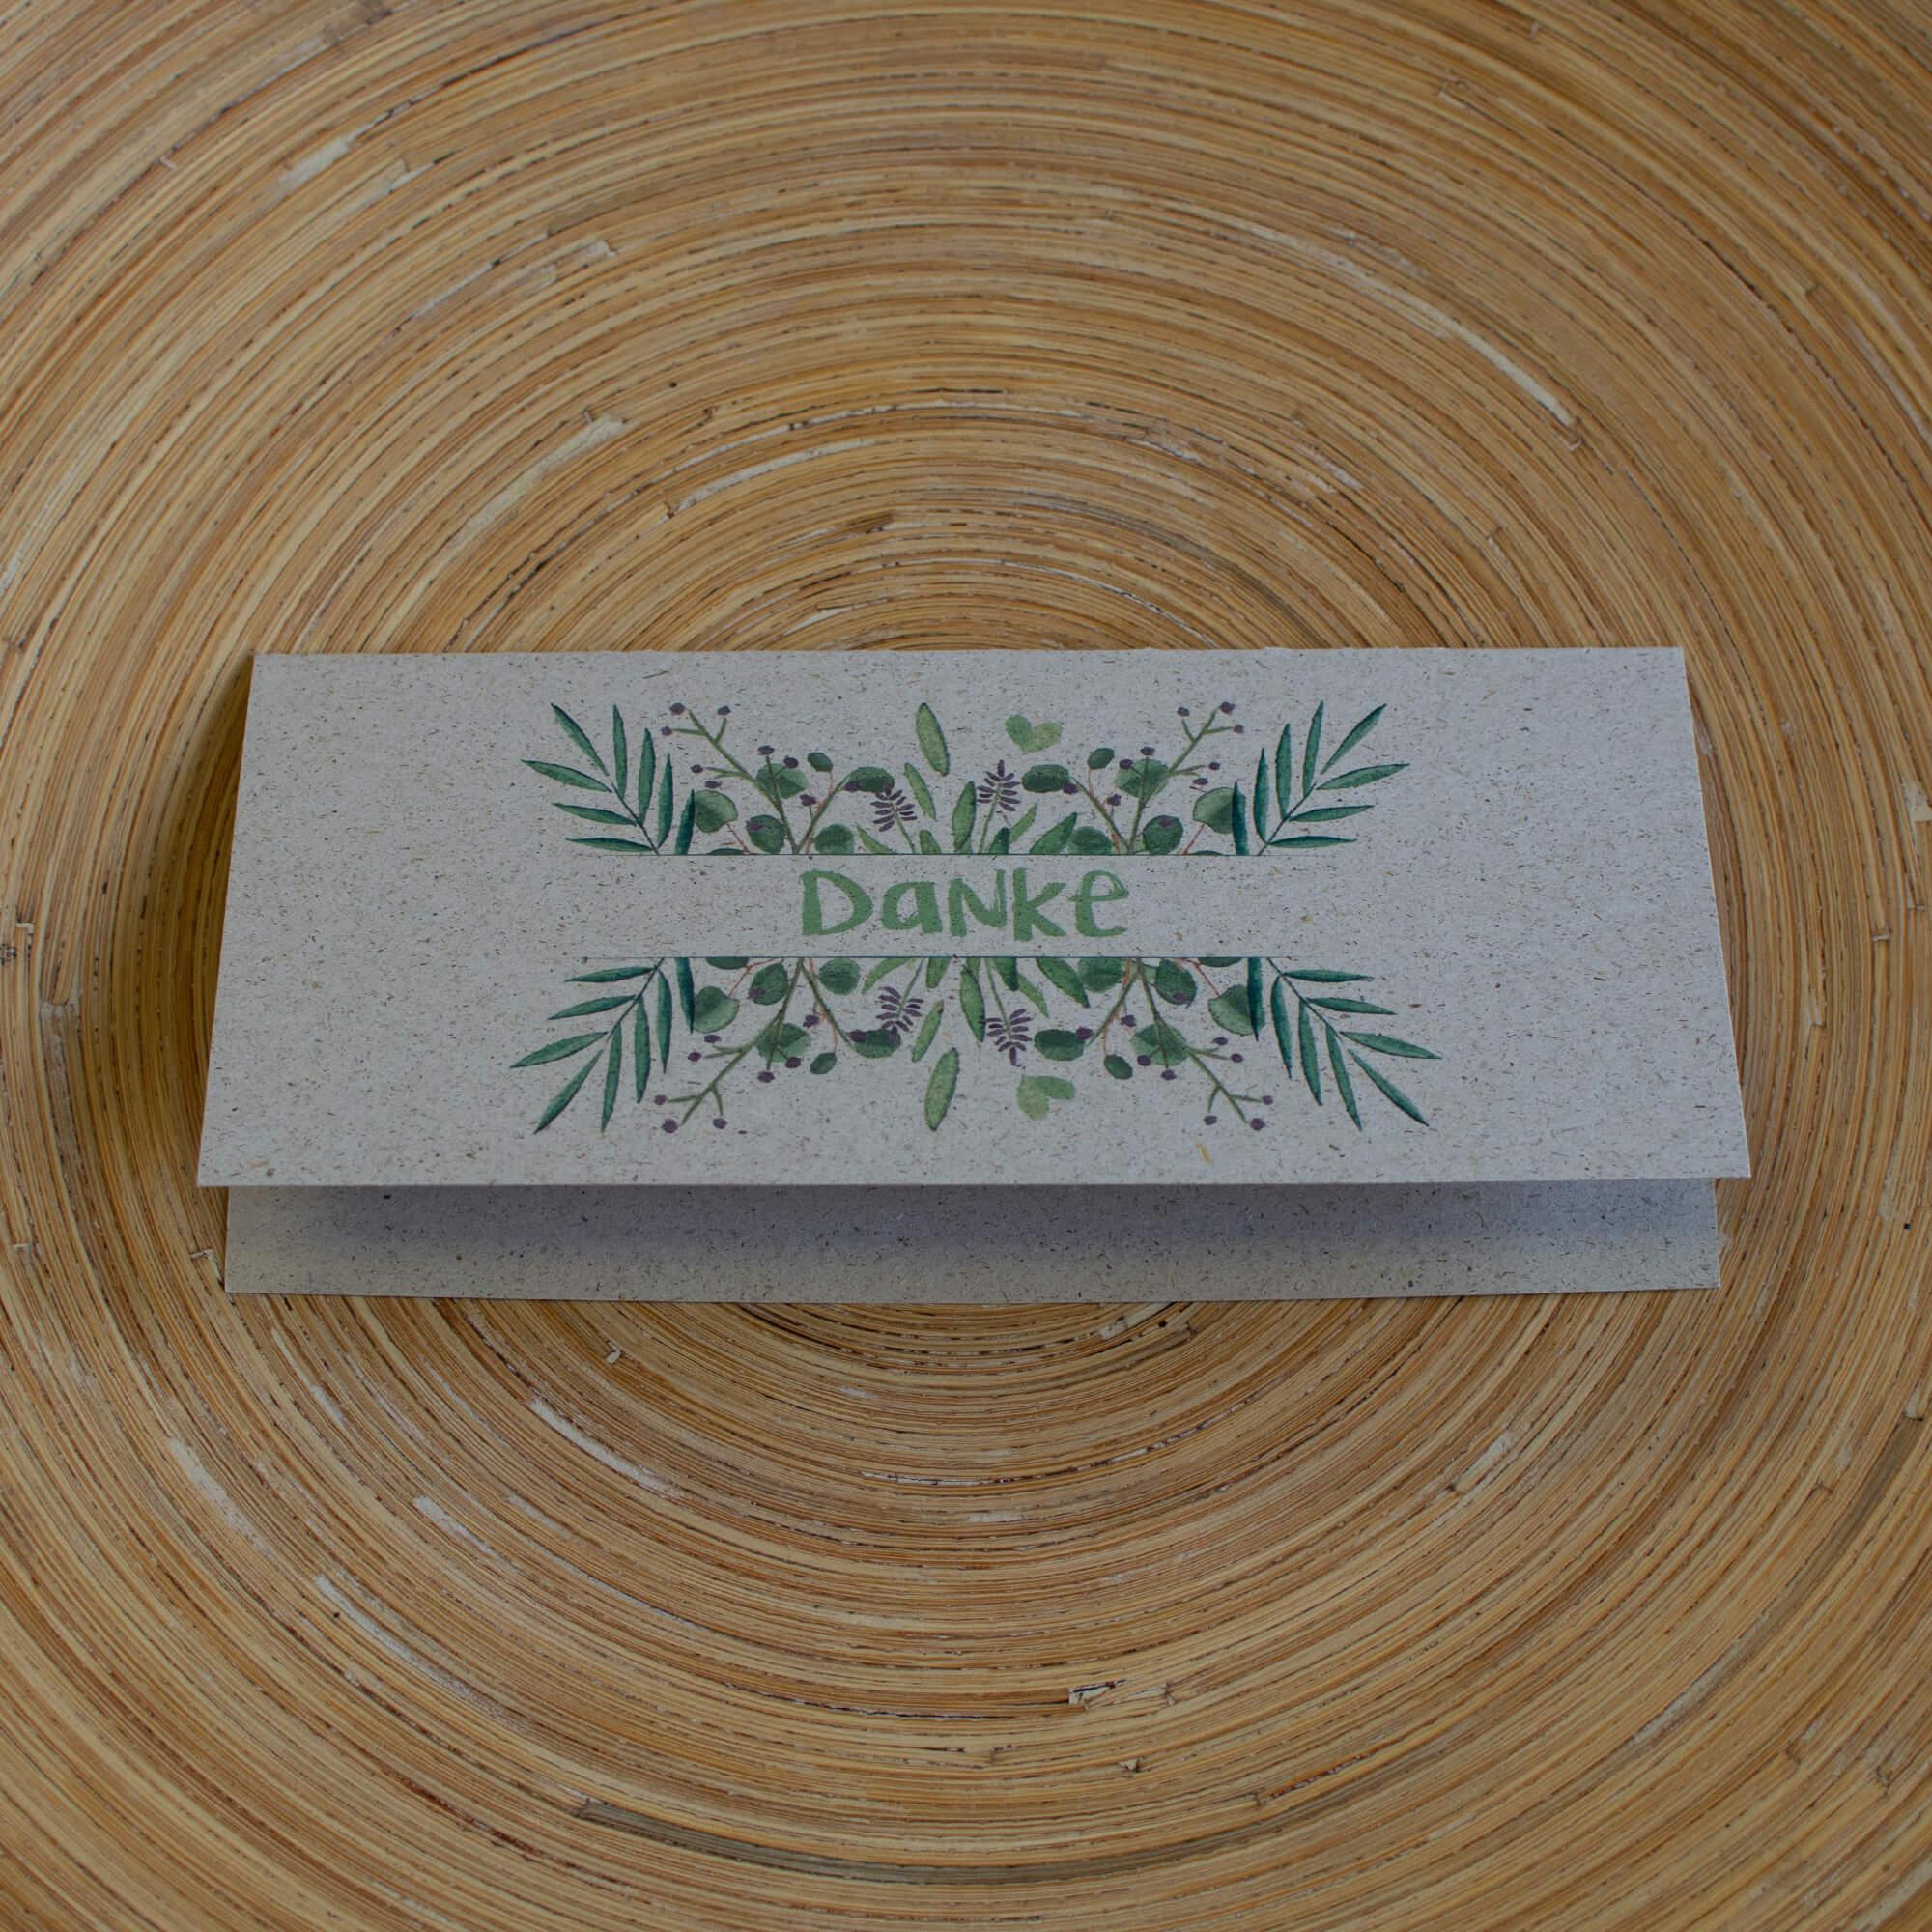 postkarkte_danke_klappkarte